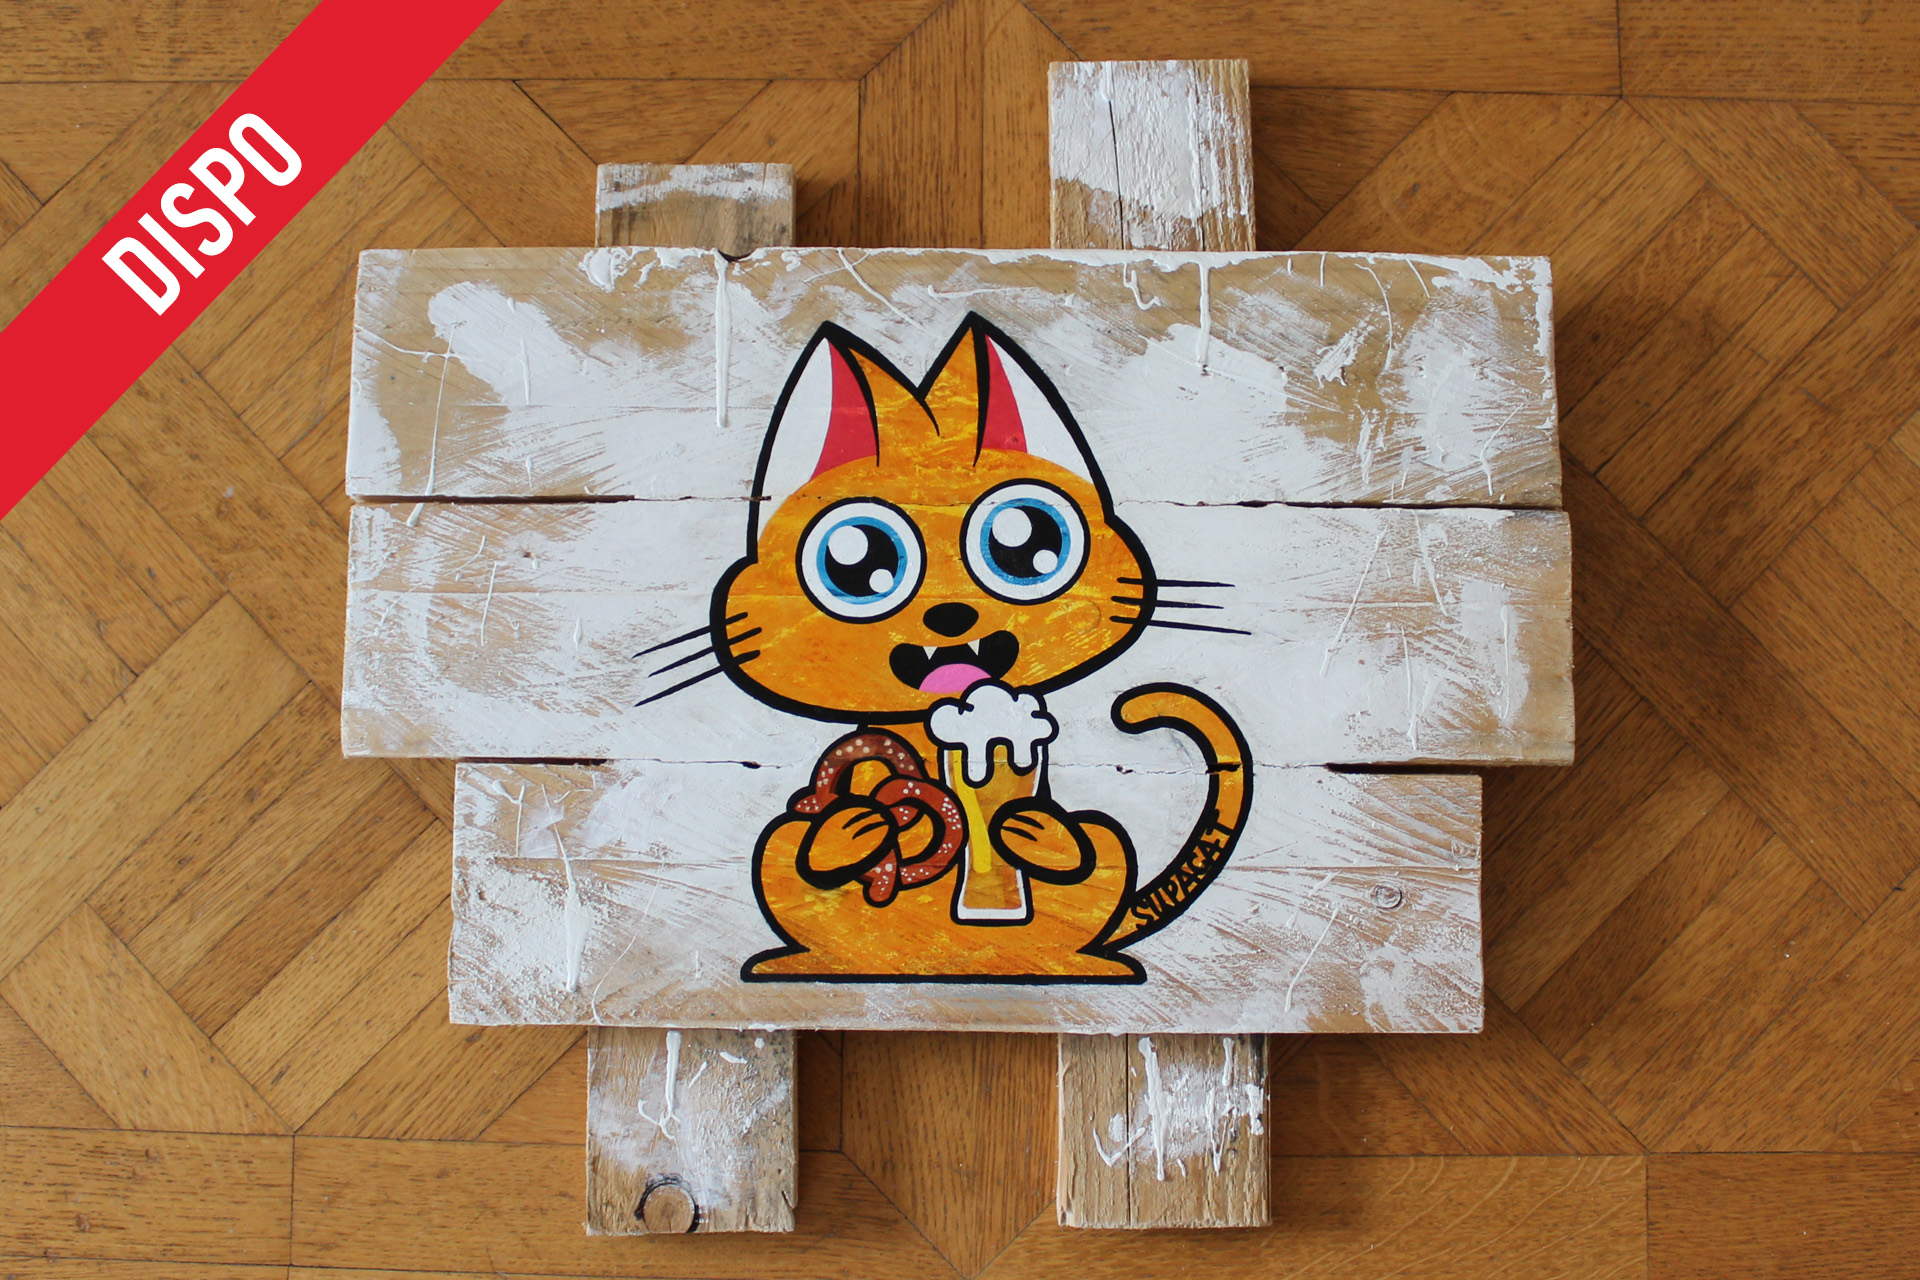 Supacat Street Art Strasbourg - Tableau Elsass Cat #3